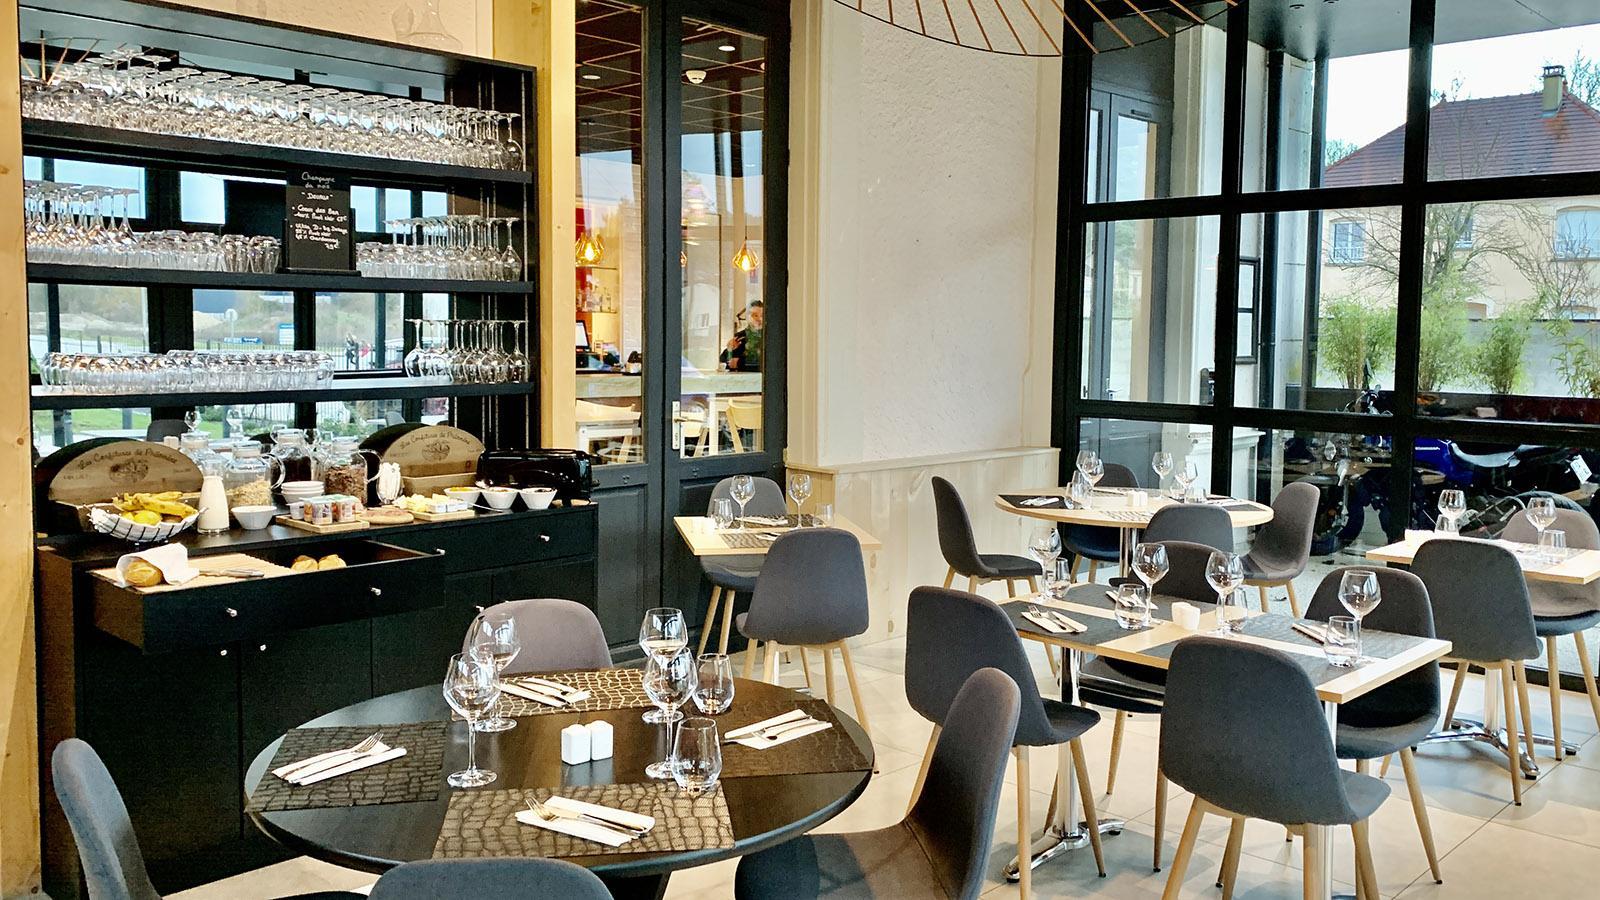 Côte des Bars: Hôtel des Tonnelles in Bar-sur-Seine. Foto: Hilke Maunder